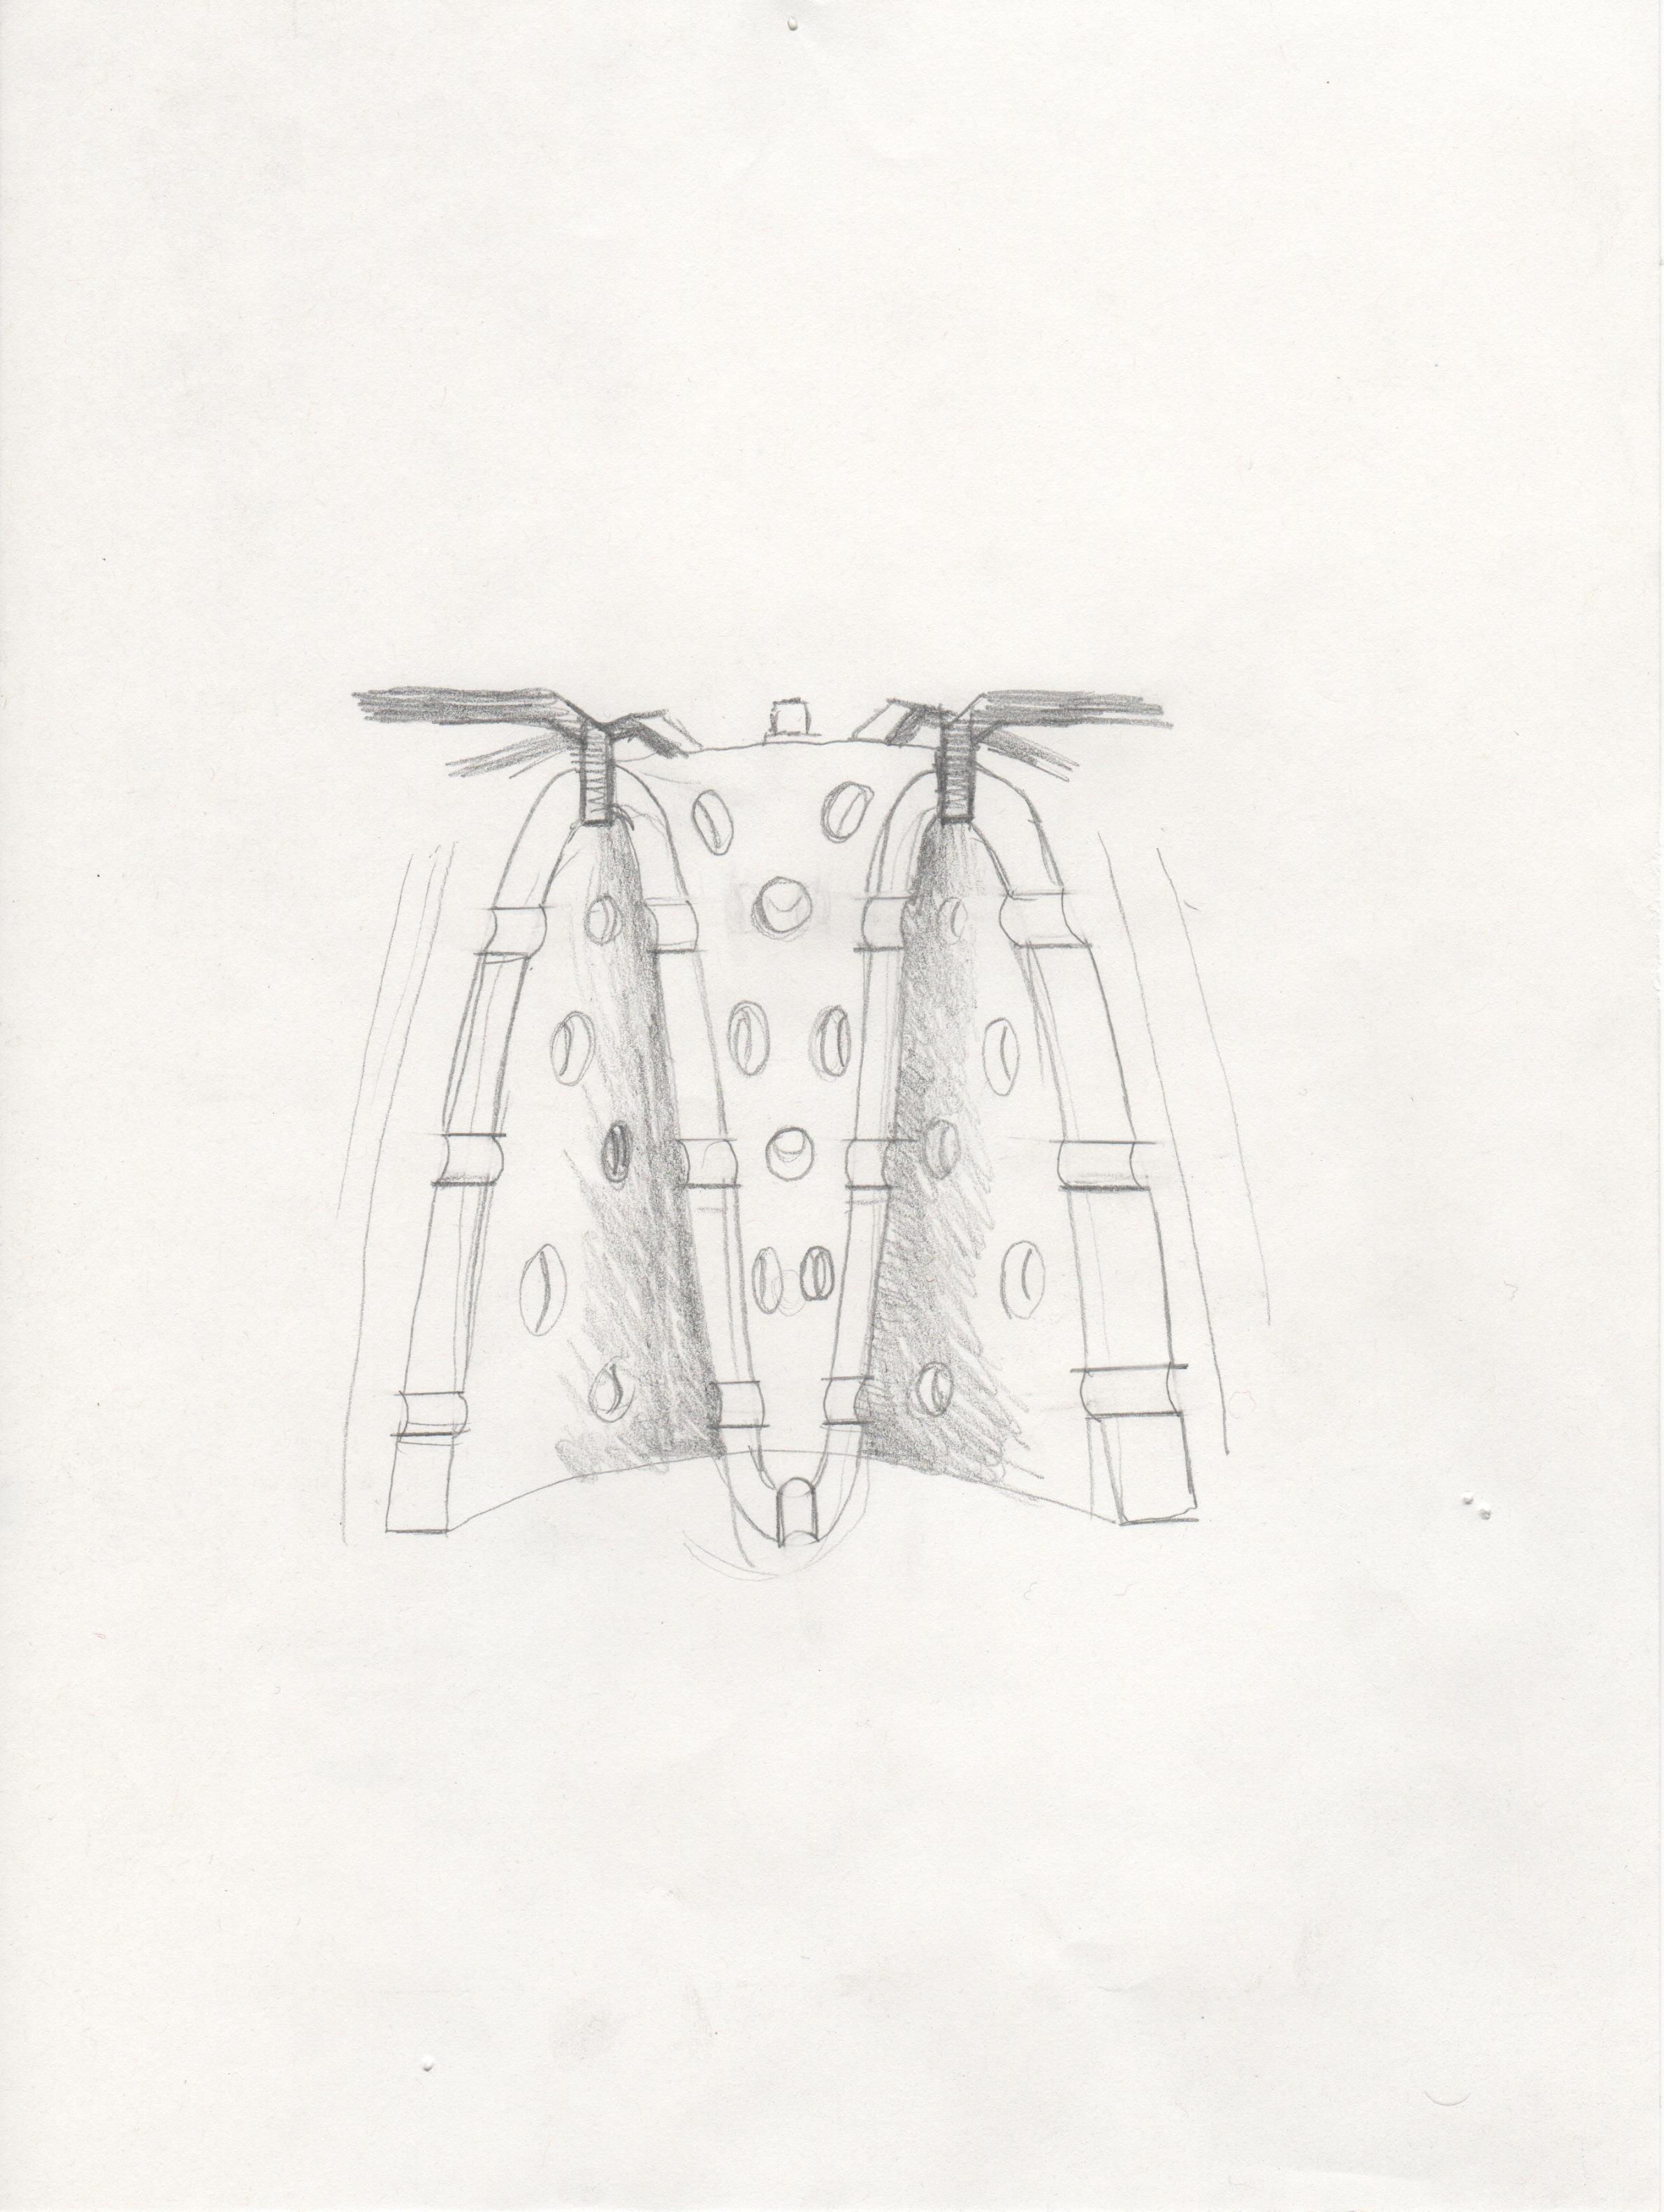 Jet Engine Sketch 4 (combustor can)